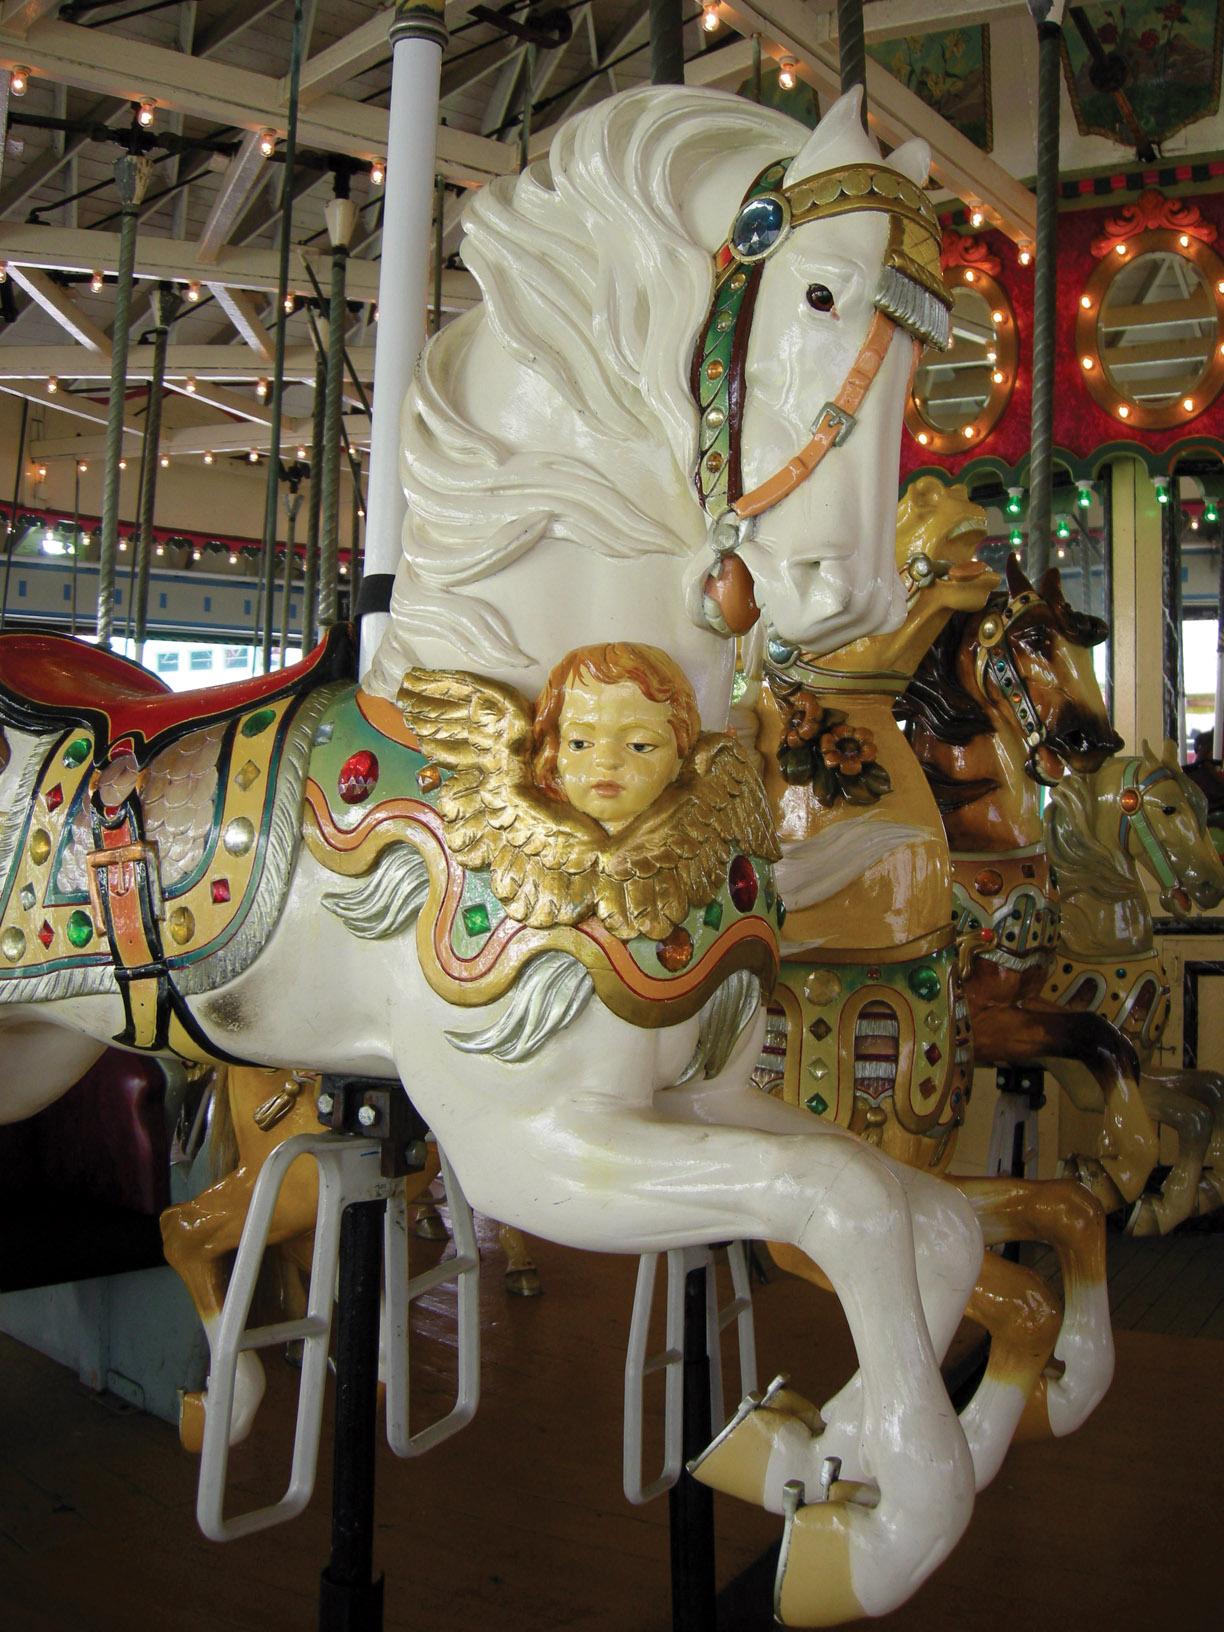 Ca-1915-Carmel-cherub-carousel-horse-Rye-Playland-JCaruso-photo